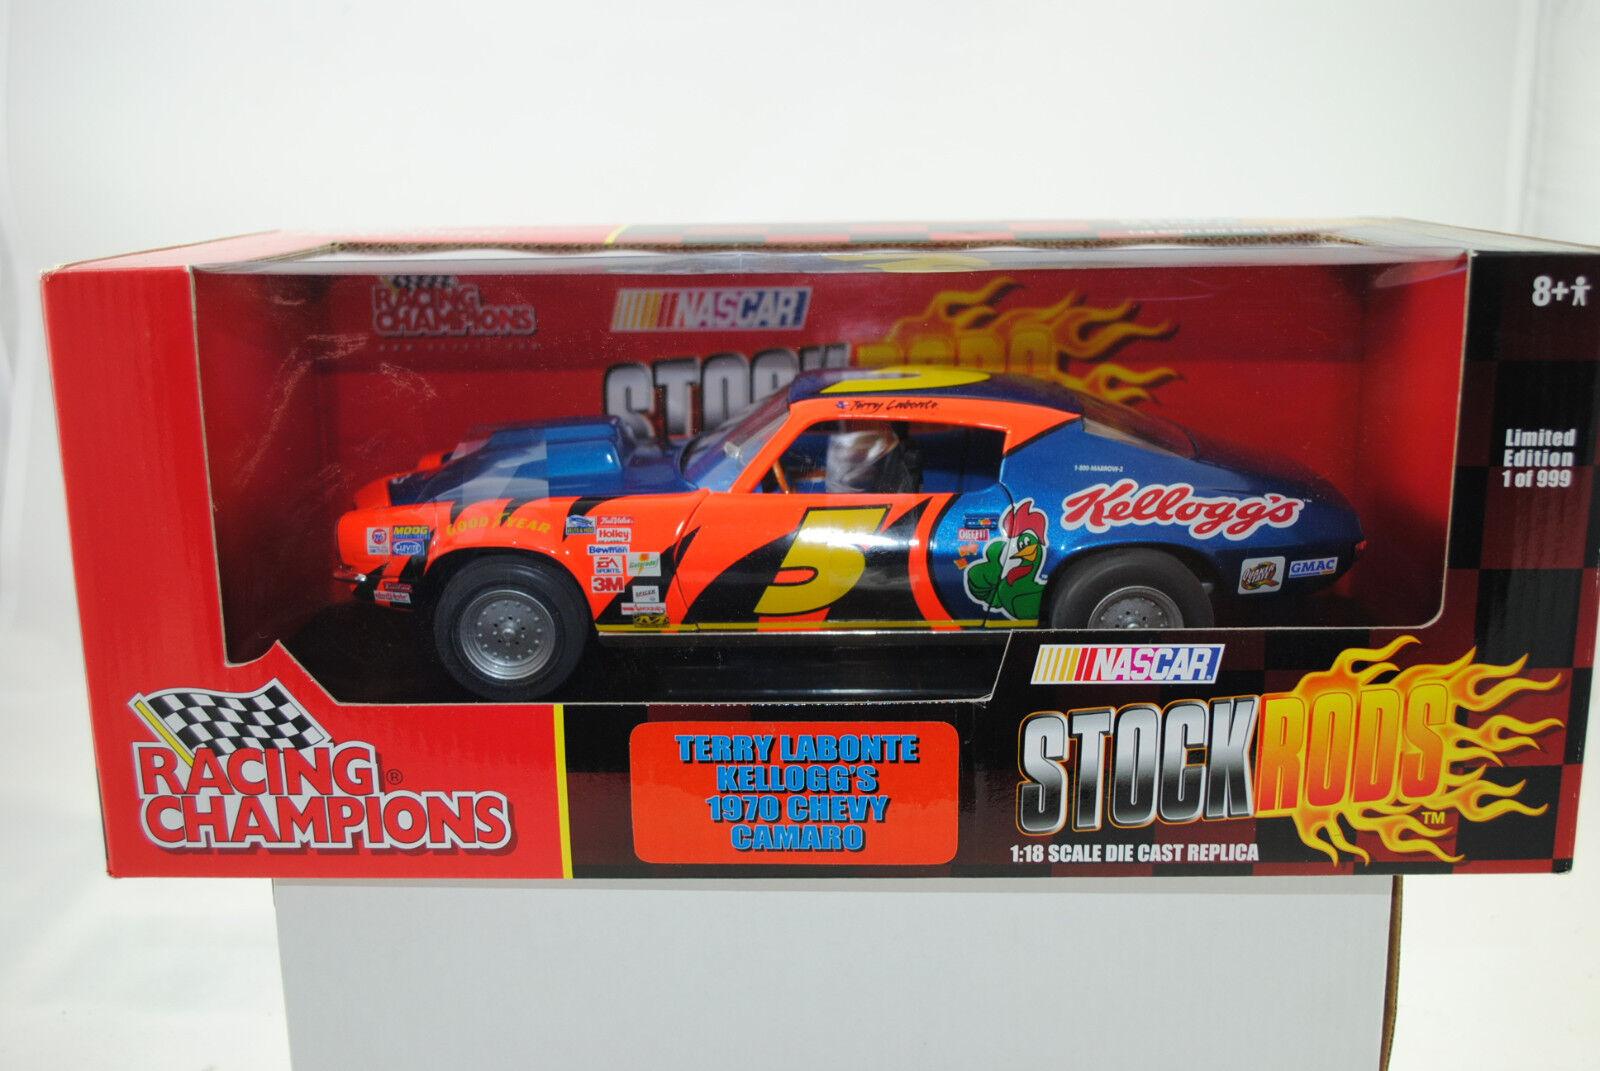 1 18 Ertl Racing Champions 1970 Chevy Camaro Terry Labonte Lmtd.edt. Nuevo